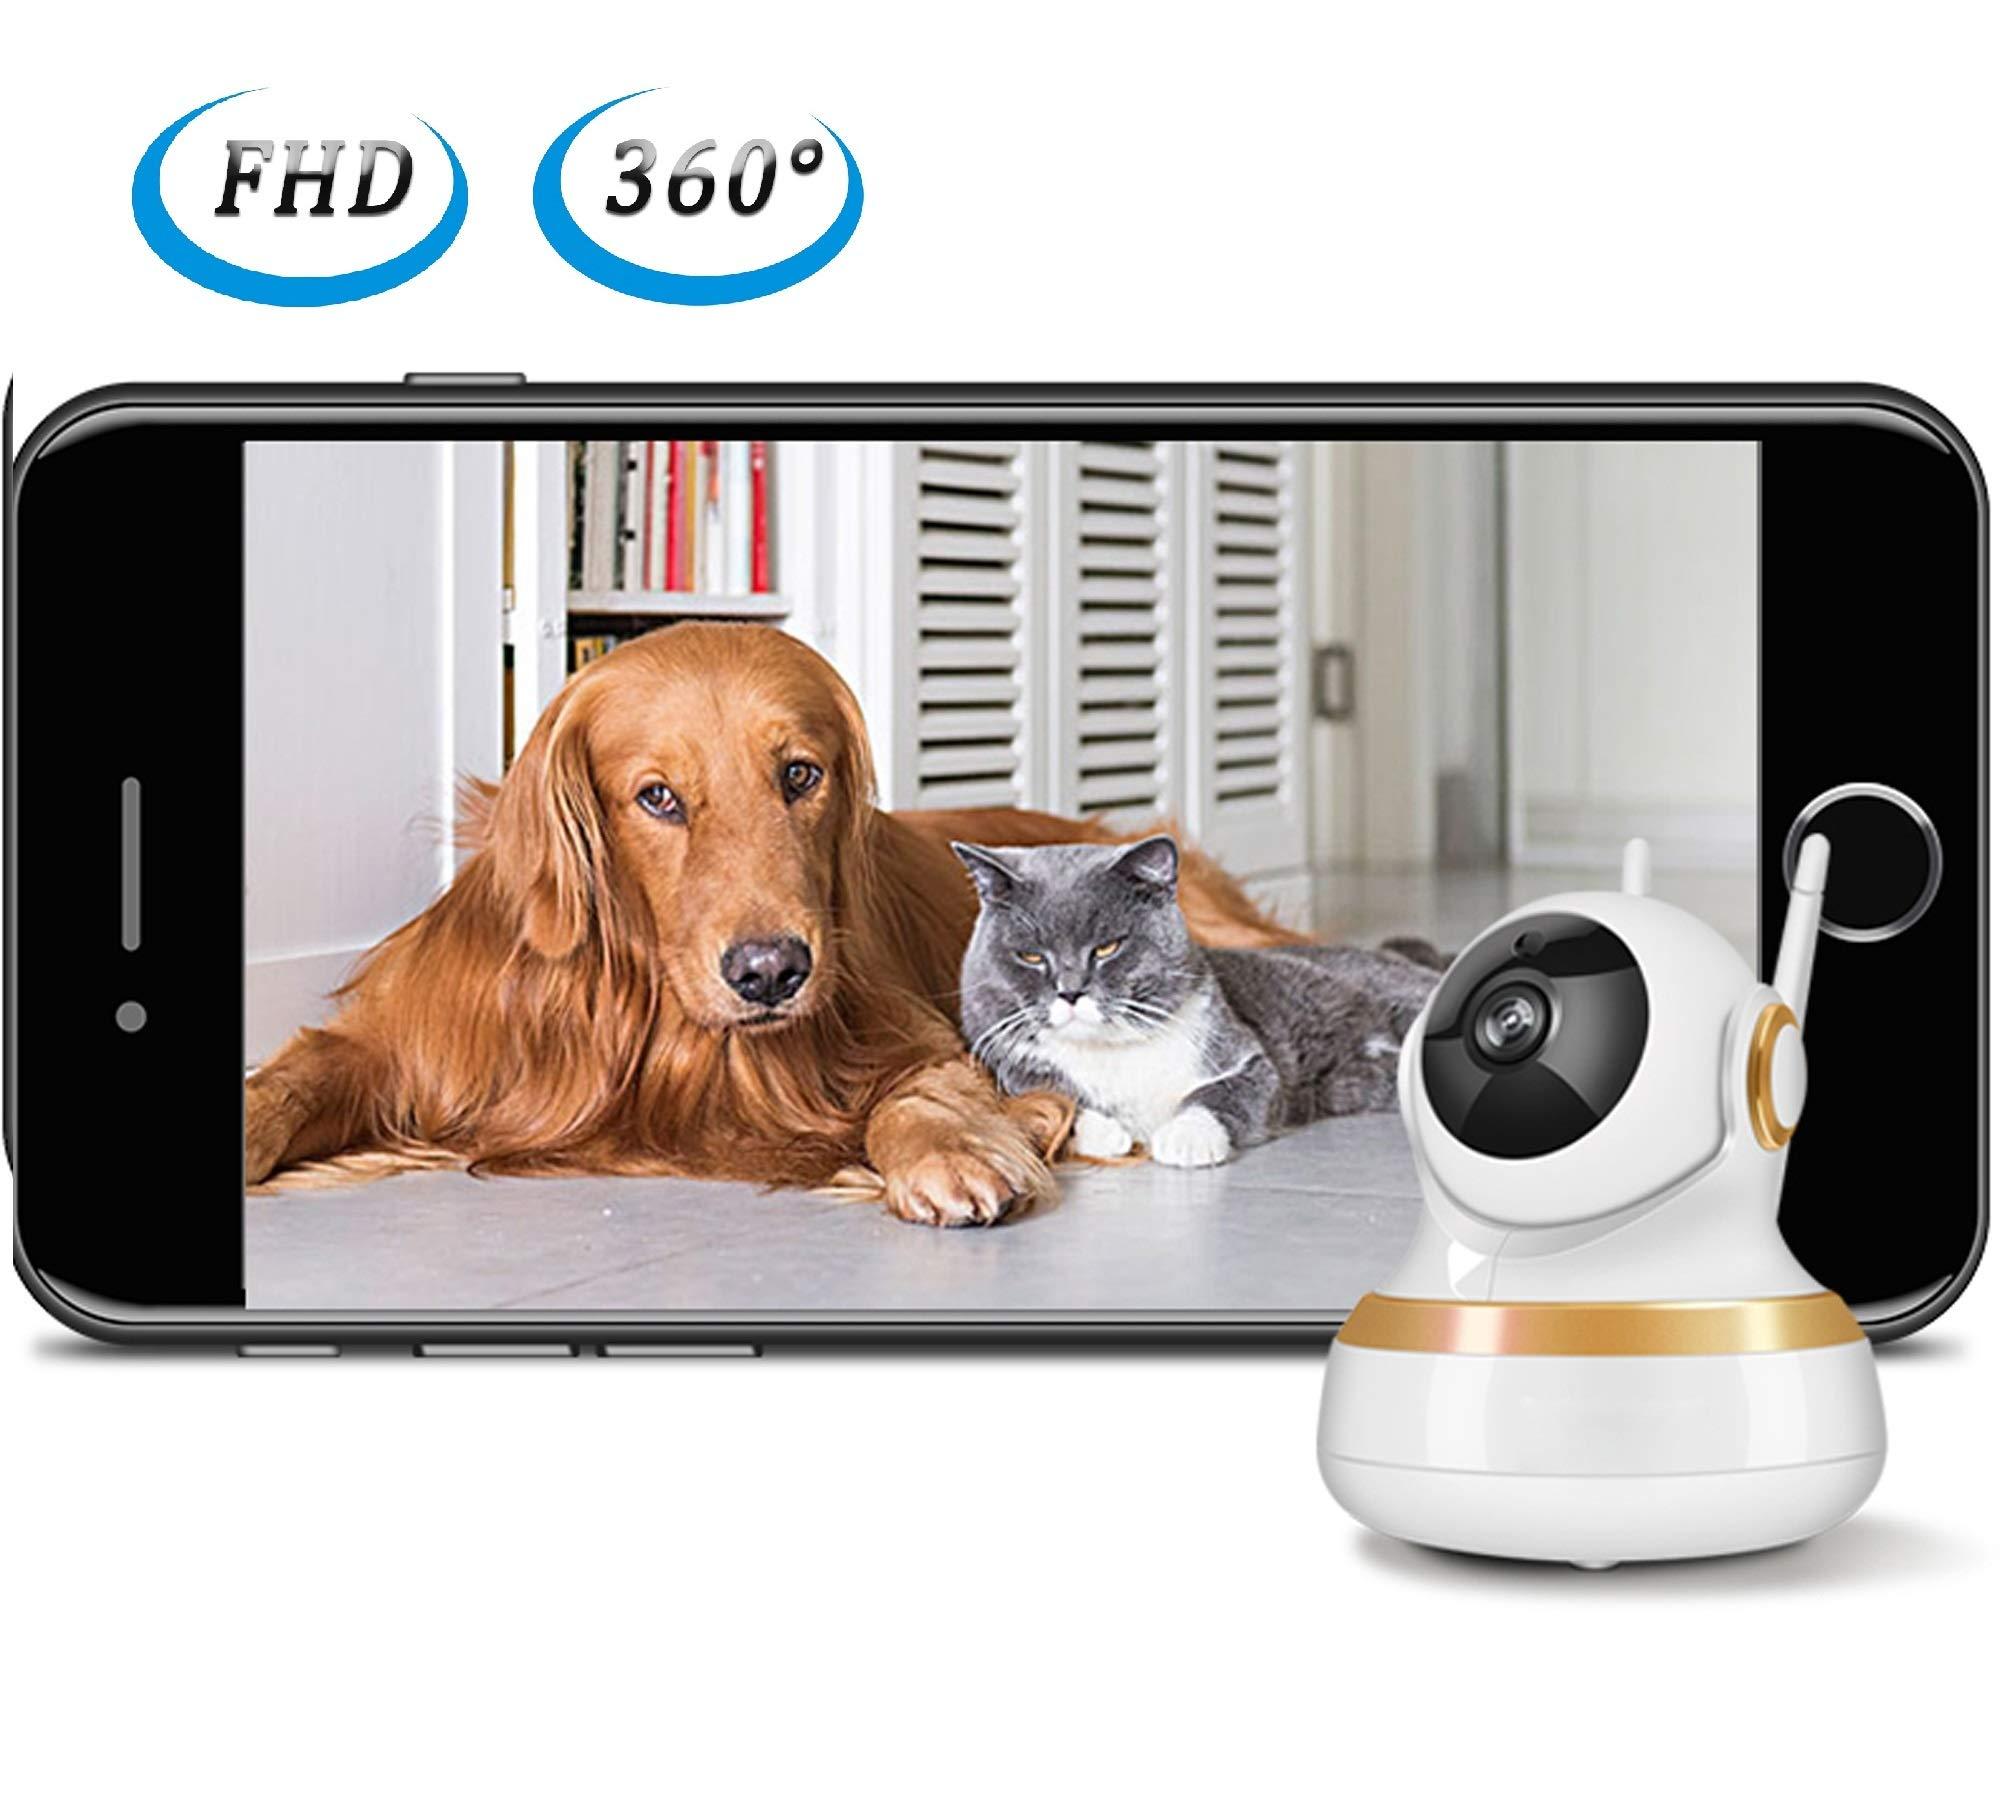 Vinsion HD 1080p Pet Camera,Dog Camera Pet Monitor Indoor Cat Camera HD Night Vision Two Way Audio and Motion Detection (Golden Rim) by Vinsion